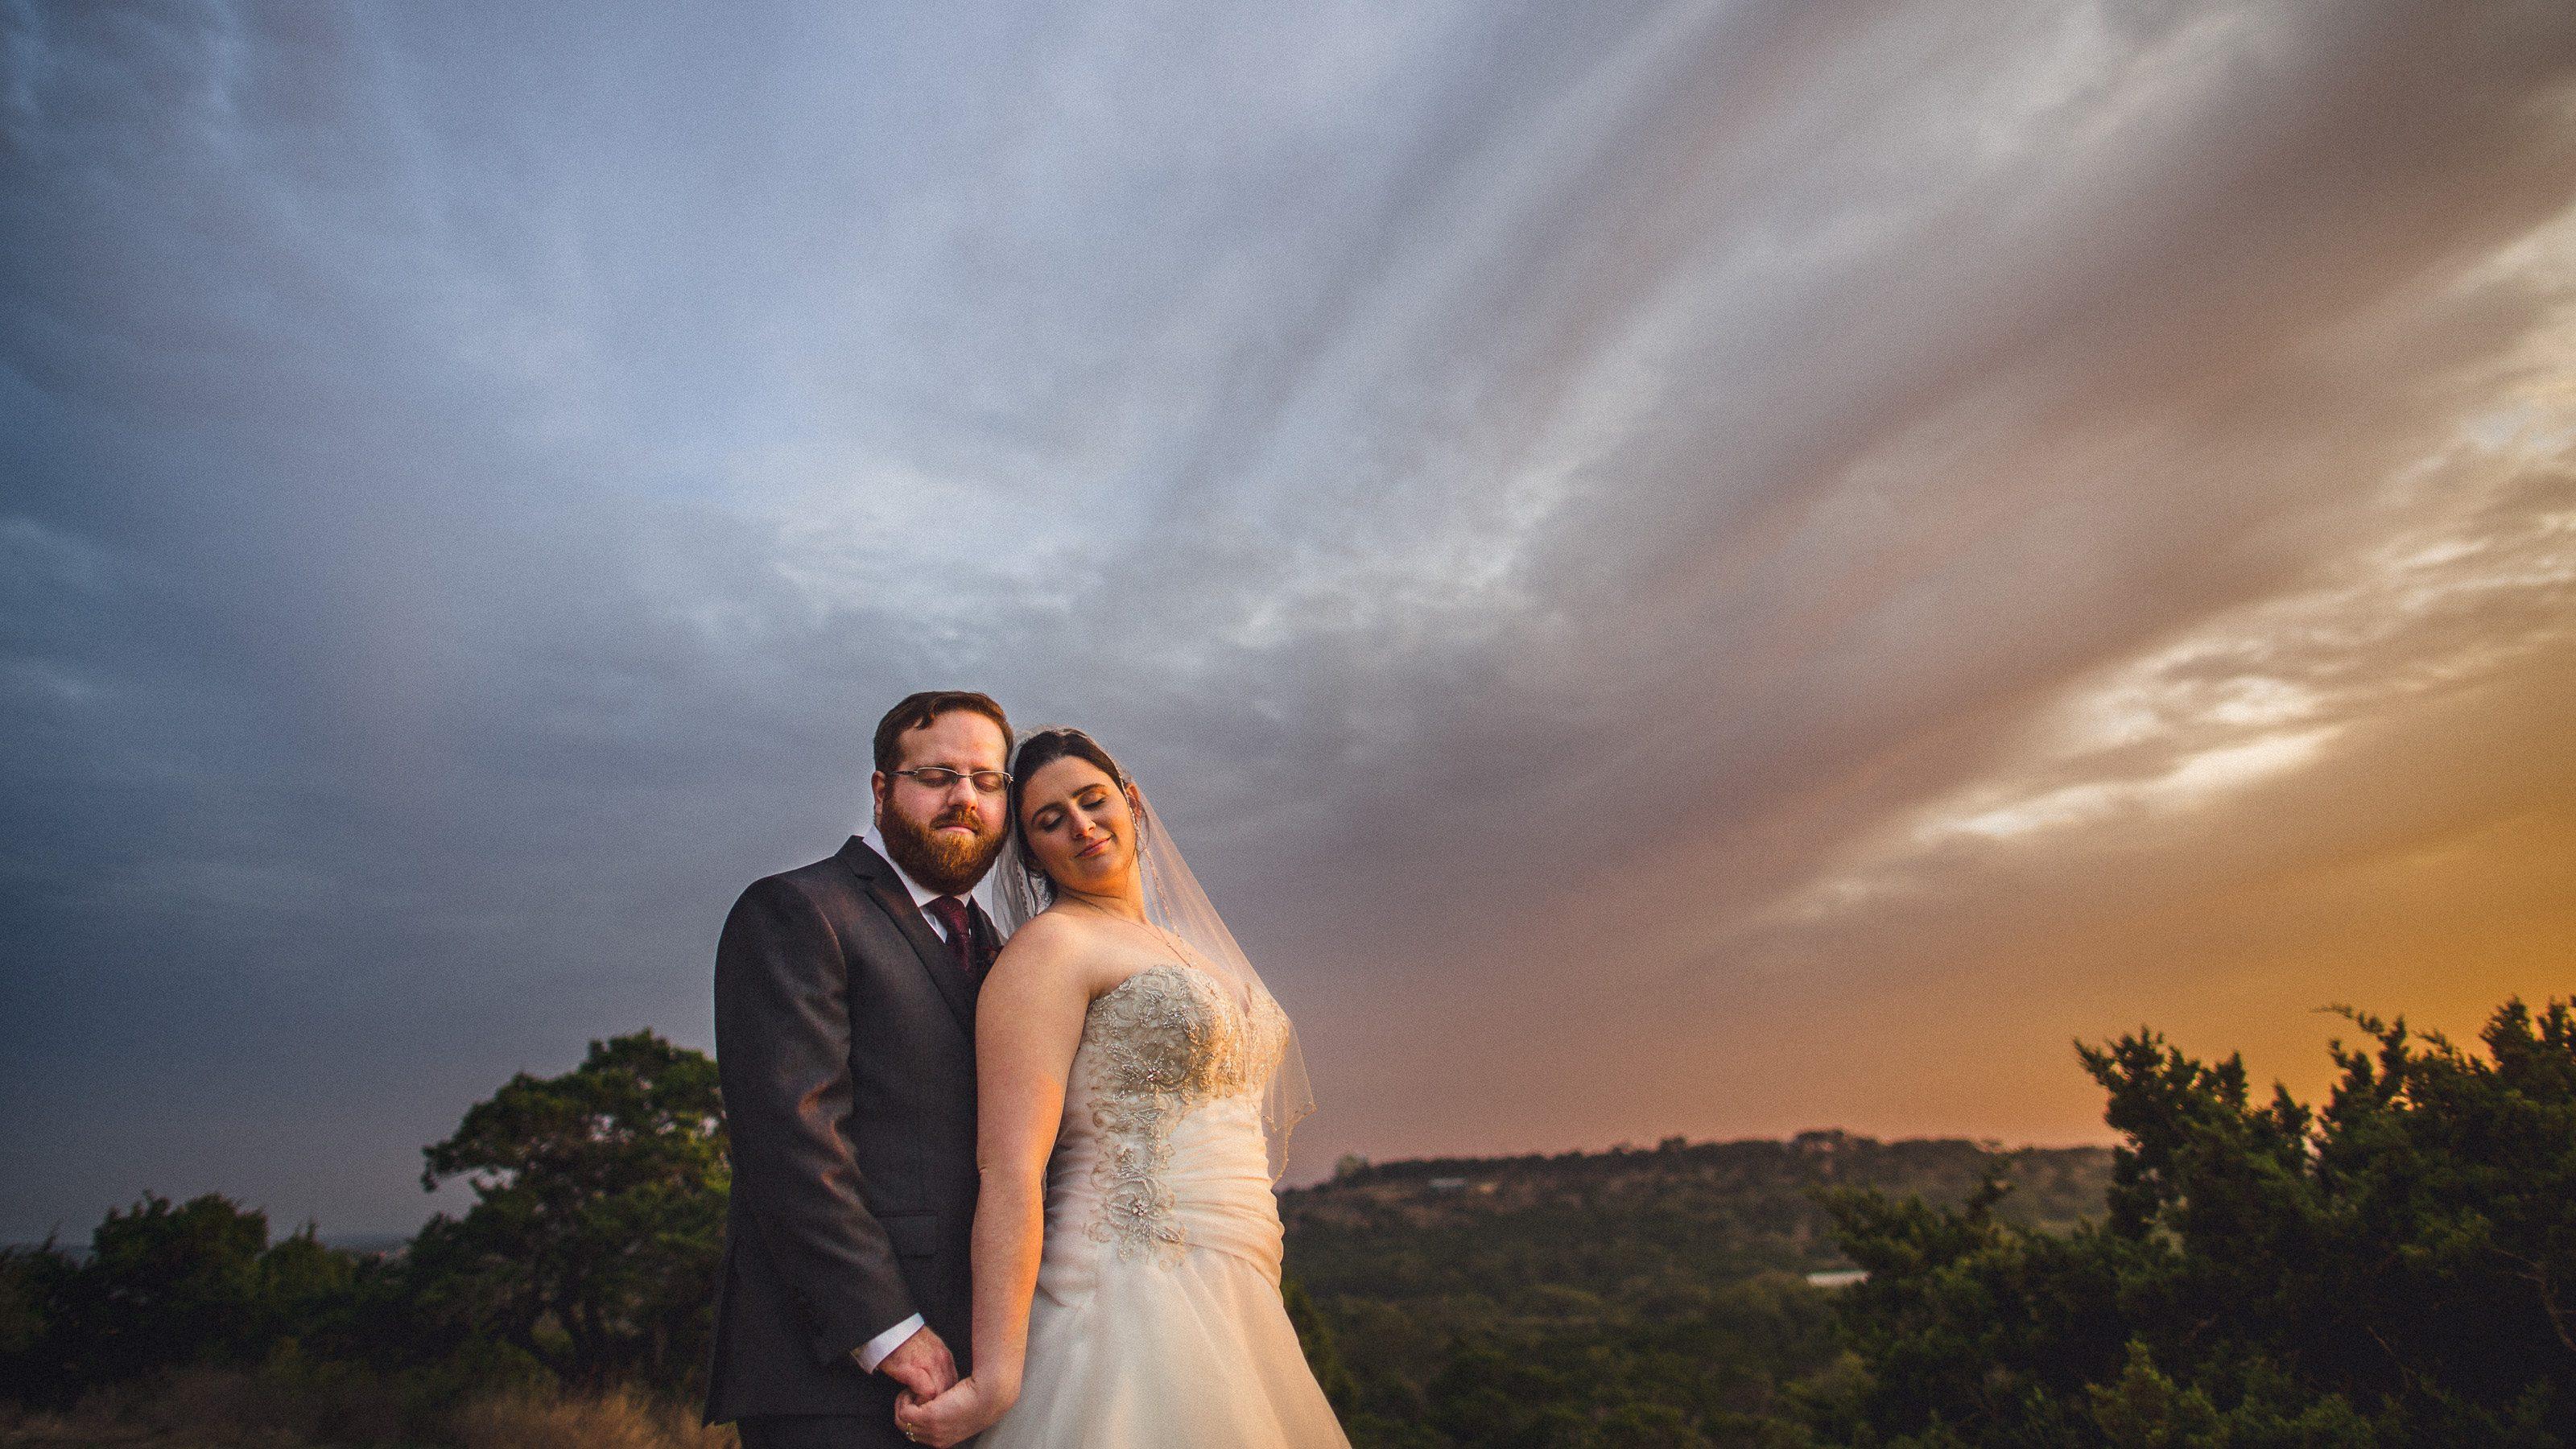 Canyonwood Ridge Wedding // Erin & Scott